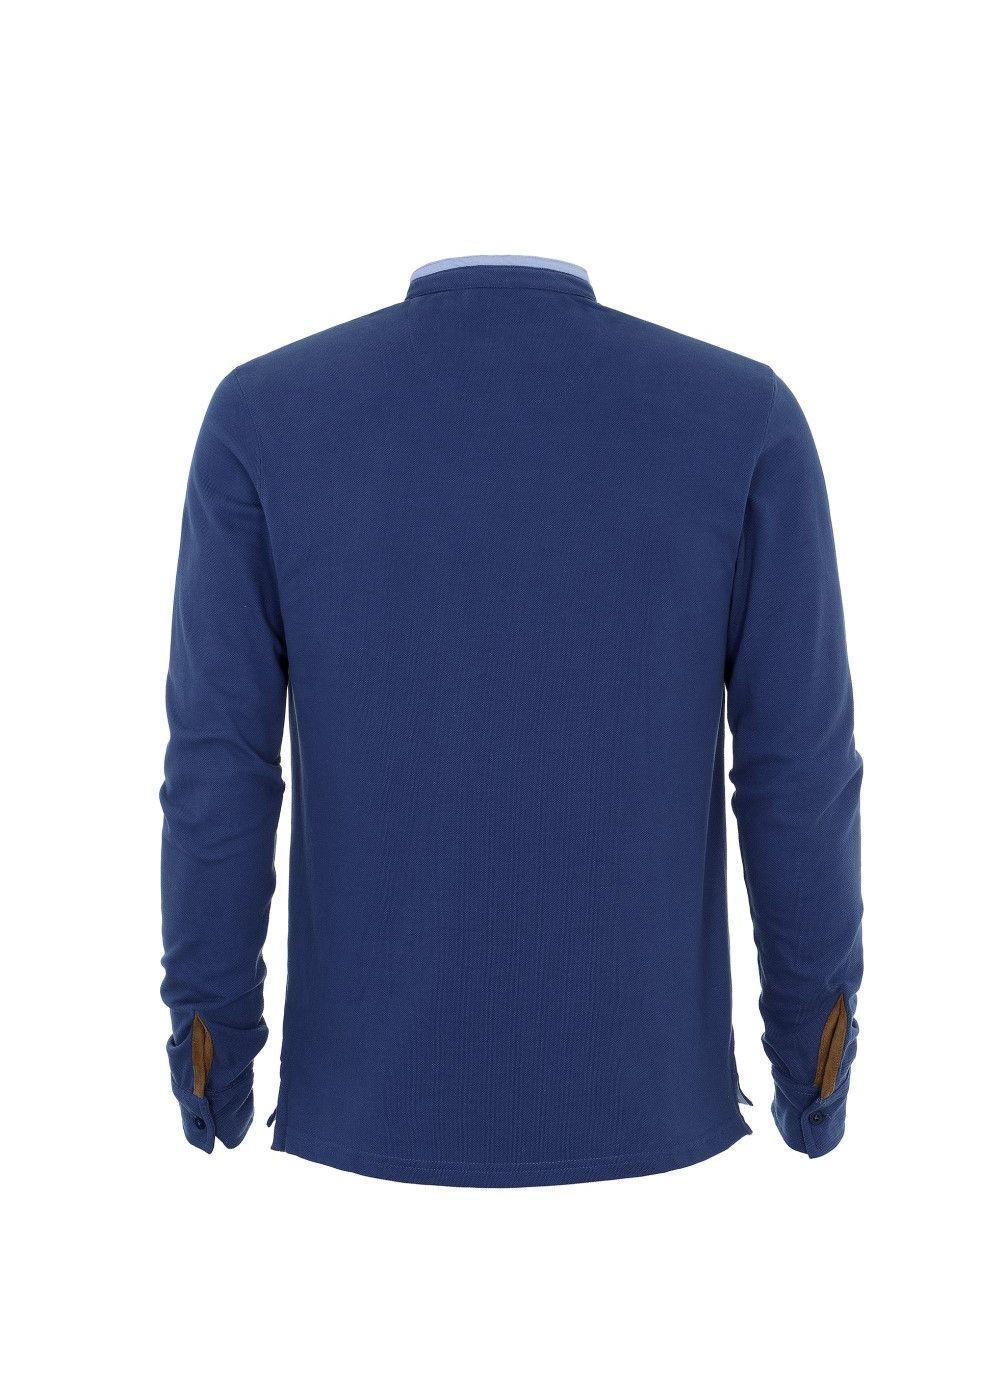 Koszulka męska LSLMT-0002-61(Z17)